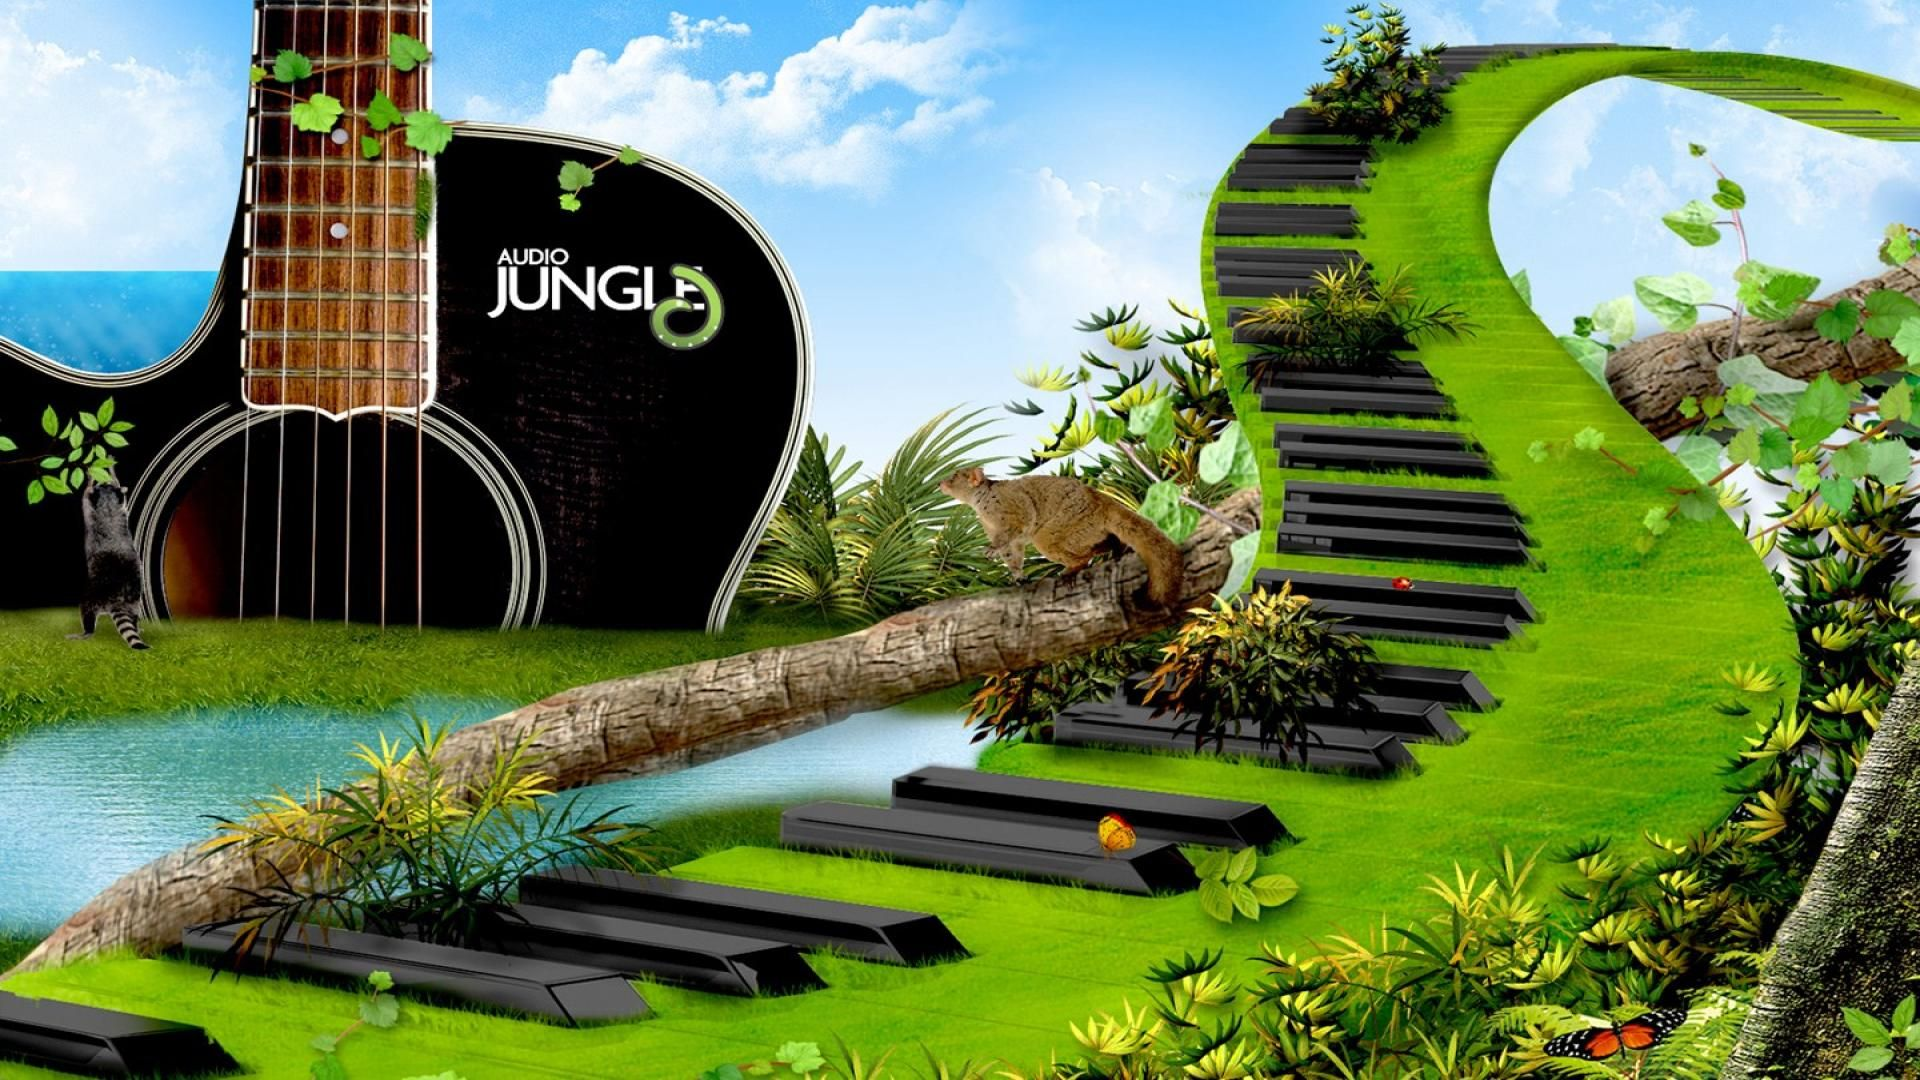 piano-landscape-creative-facebook-timeline-cover1920x108066257.jpg (1920×1080)